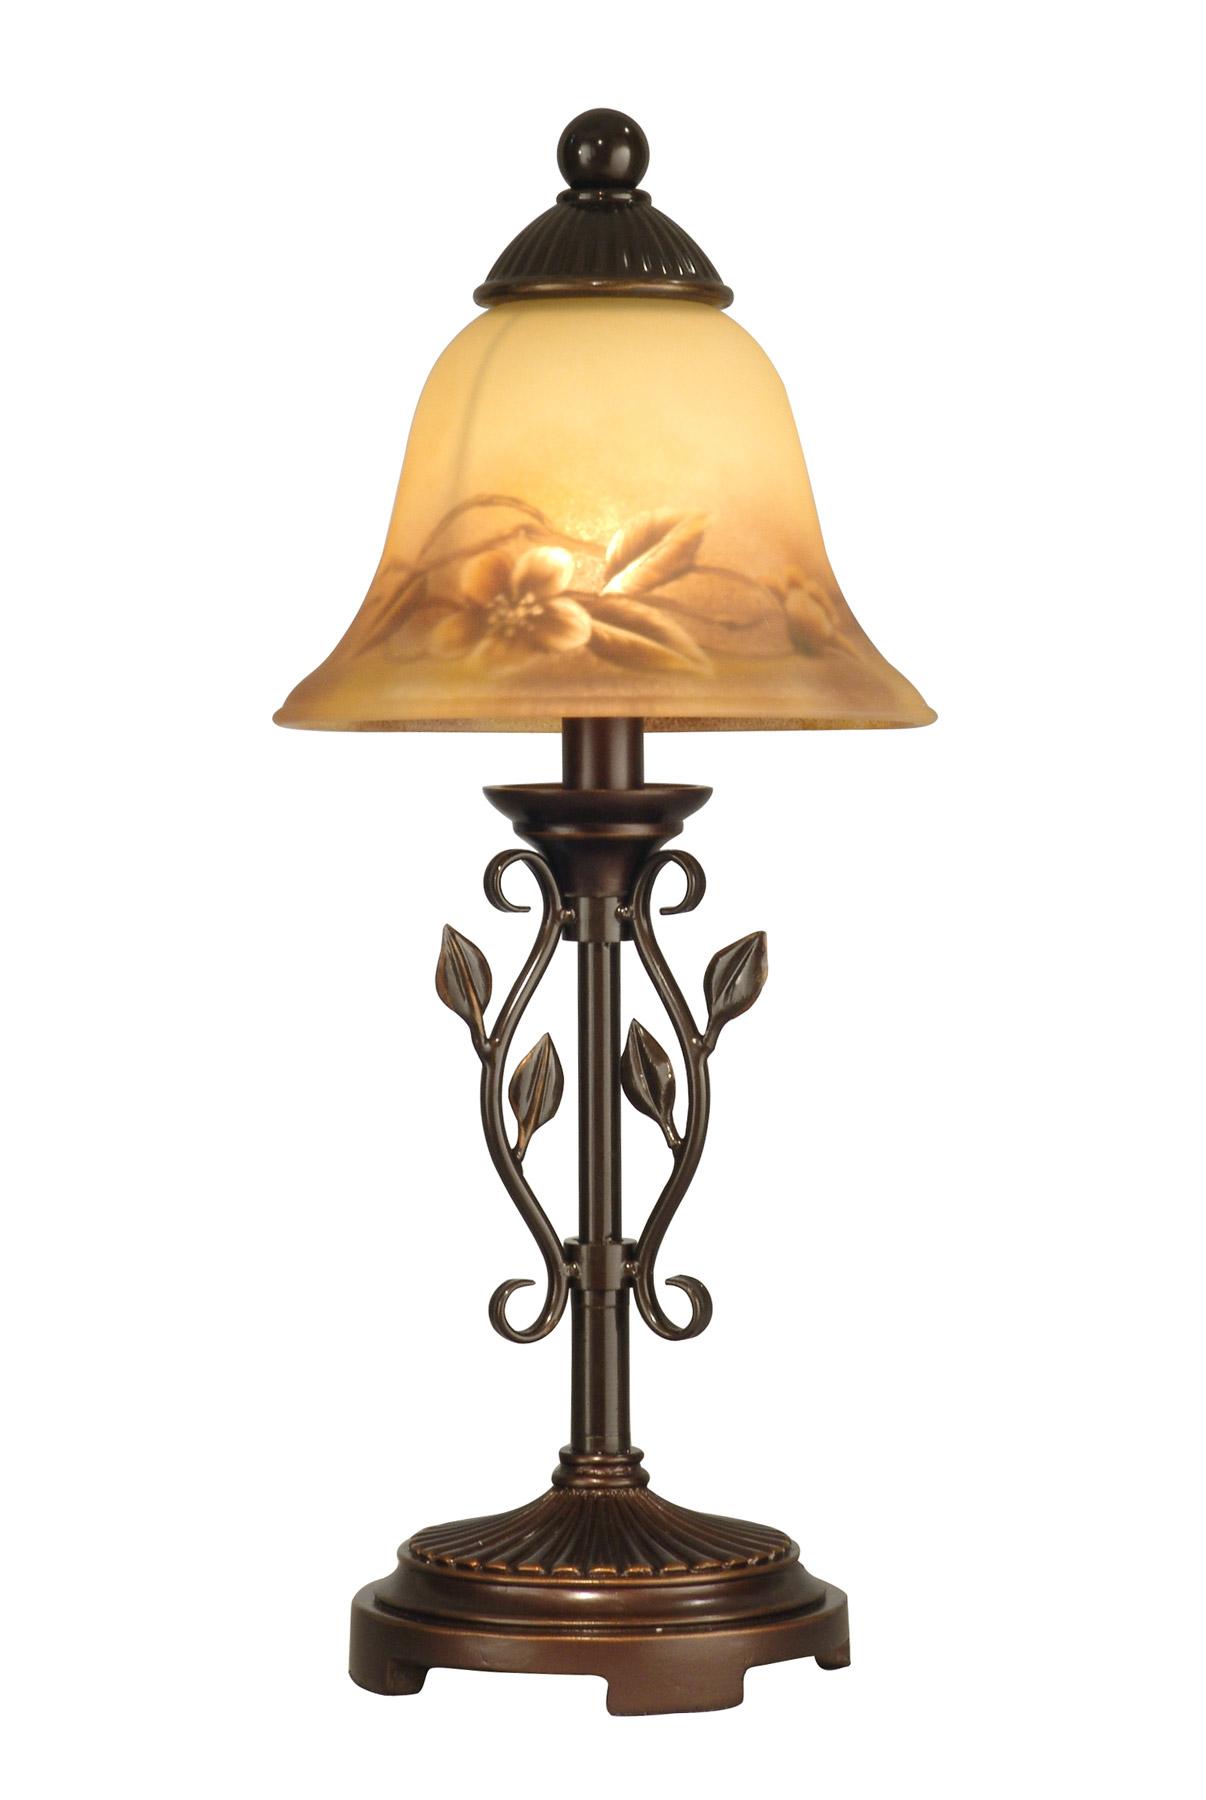 Dale Tiffany Ta80540 Leaf Vine Mini Accent Lamp